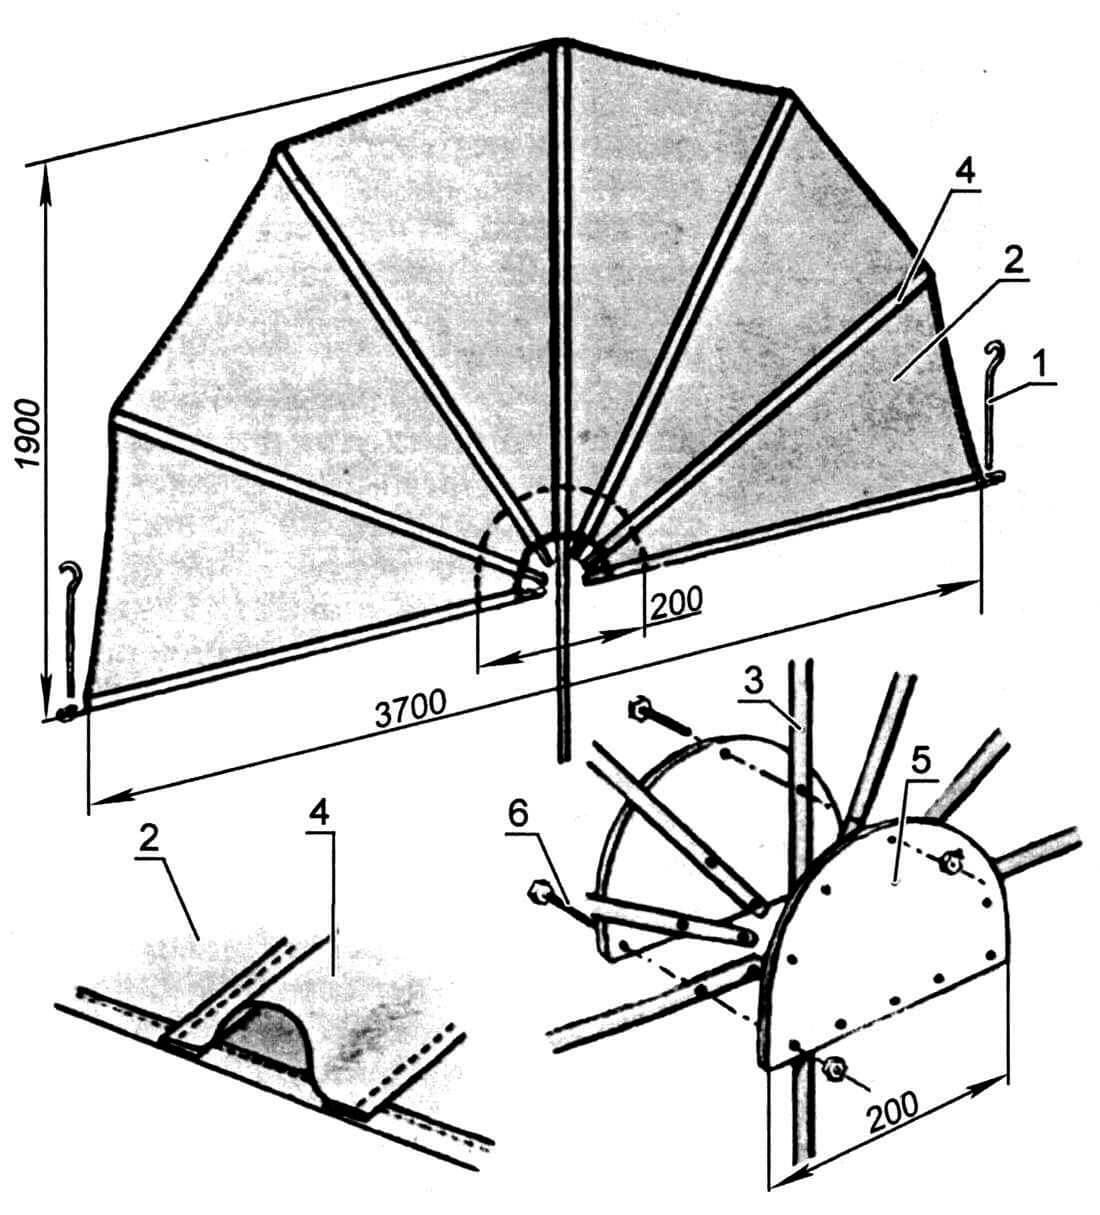 Ширма от ветра: 1 - угловая шпилька (сталь, ø4мм, 2 шт.); 2 - полотнище ширмы (брезент, капрон, S=6 м2); 3 - элемент каркаса (Д16 ø10-15x1 мм, длина 1800 мм - 6 шт., 2400 мм - 1 шт.); 4 - карман (7 шт.); 5 - фиксатор (текстолит, All-сплав, толщина 3 мм, 2 шт.); 6 - болт-гайка М4 (10 комплектов)